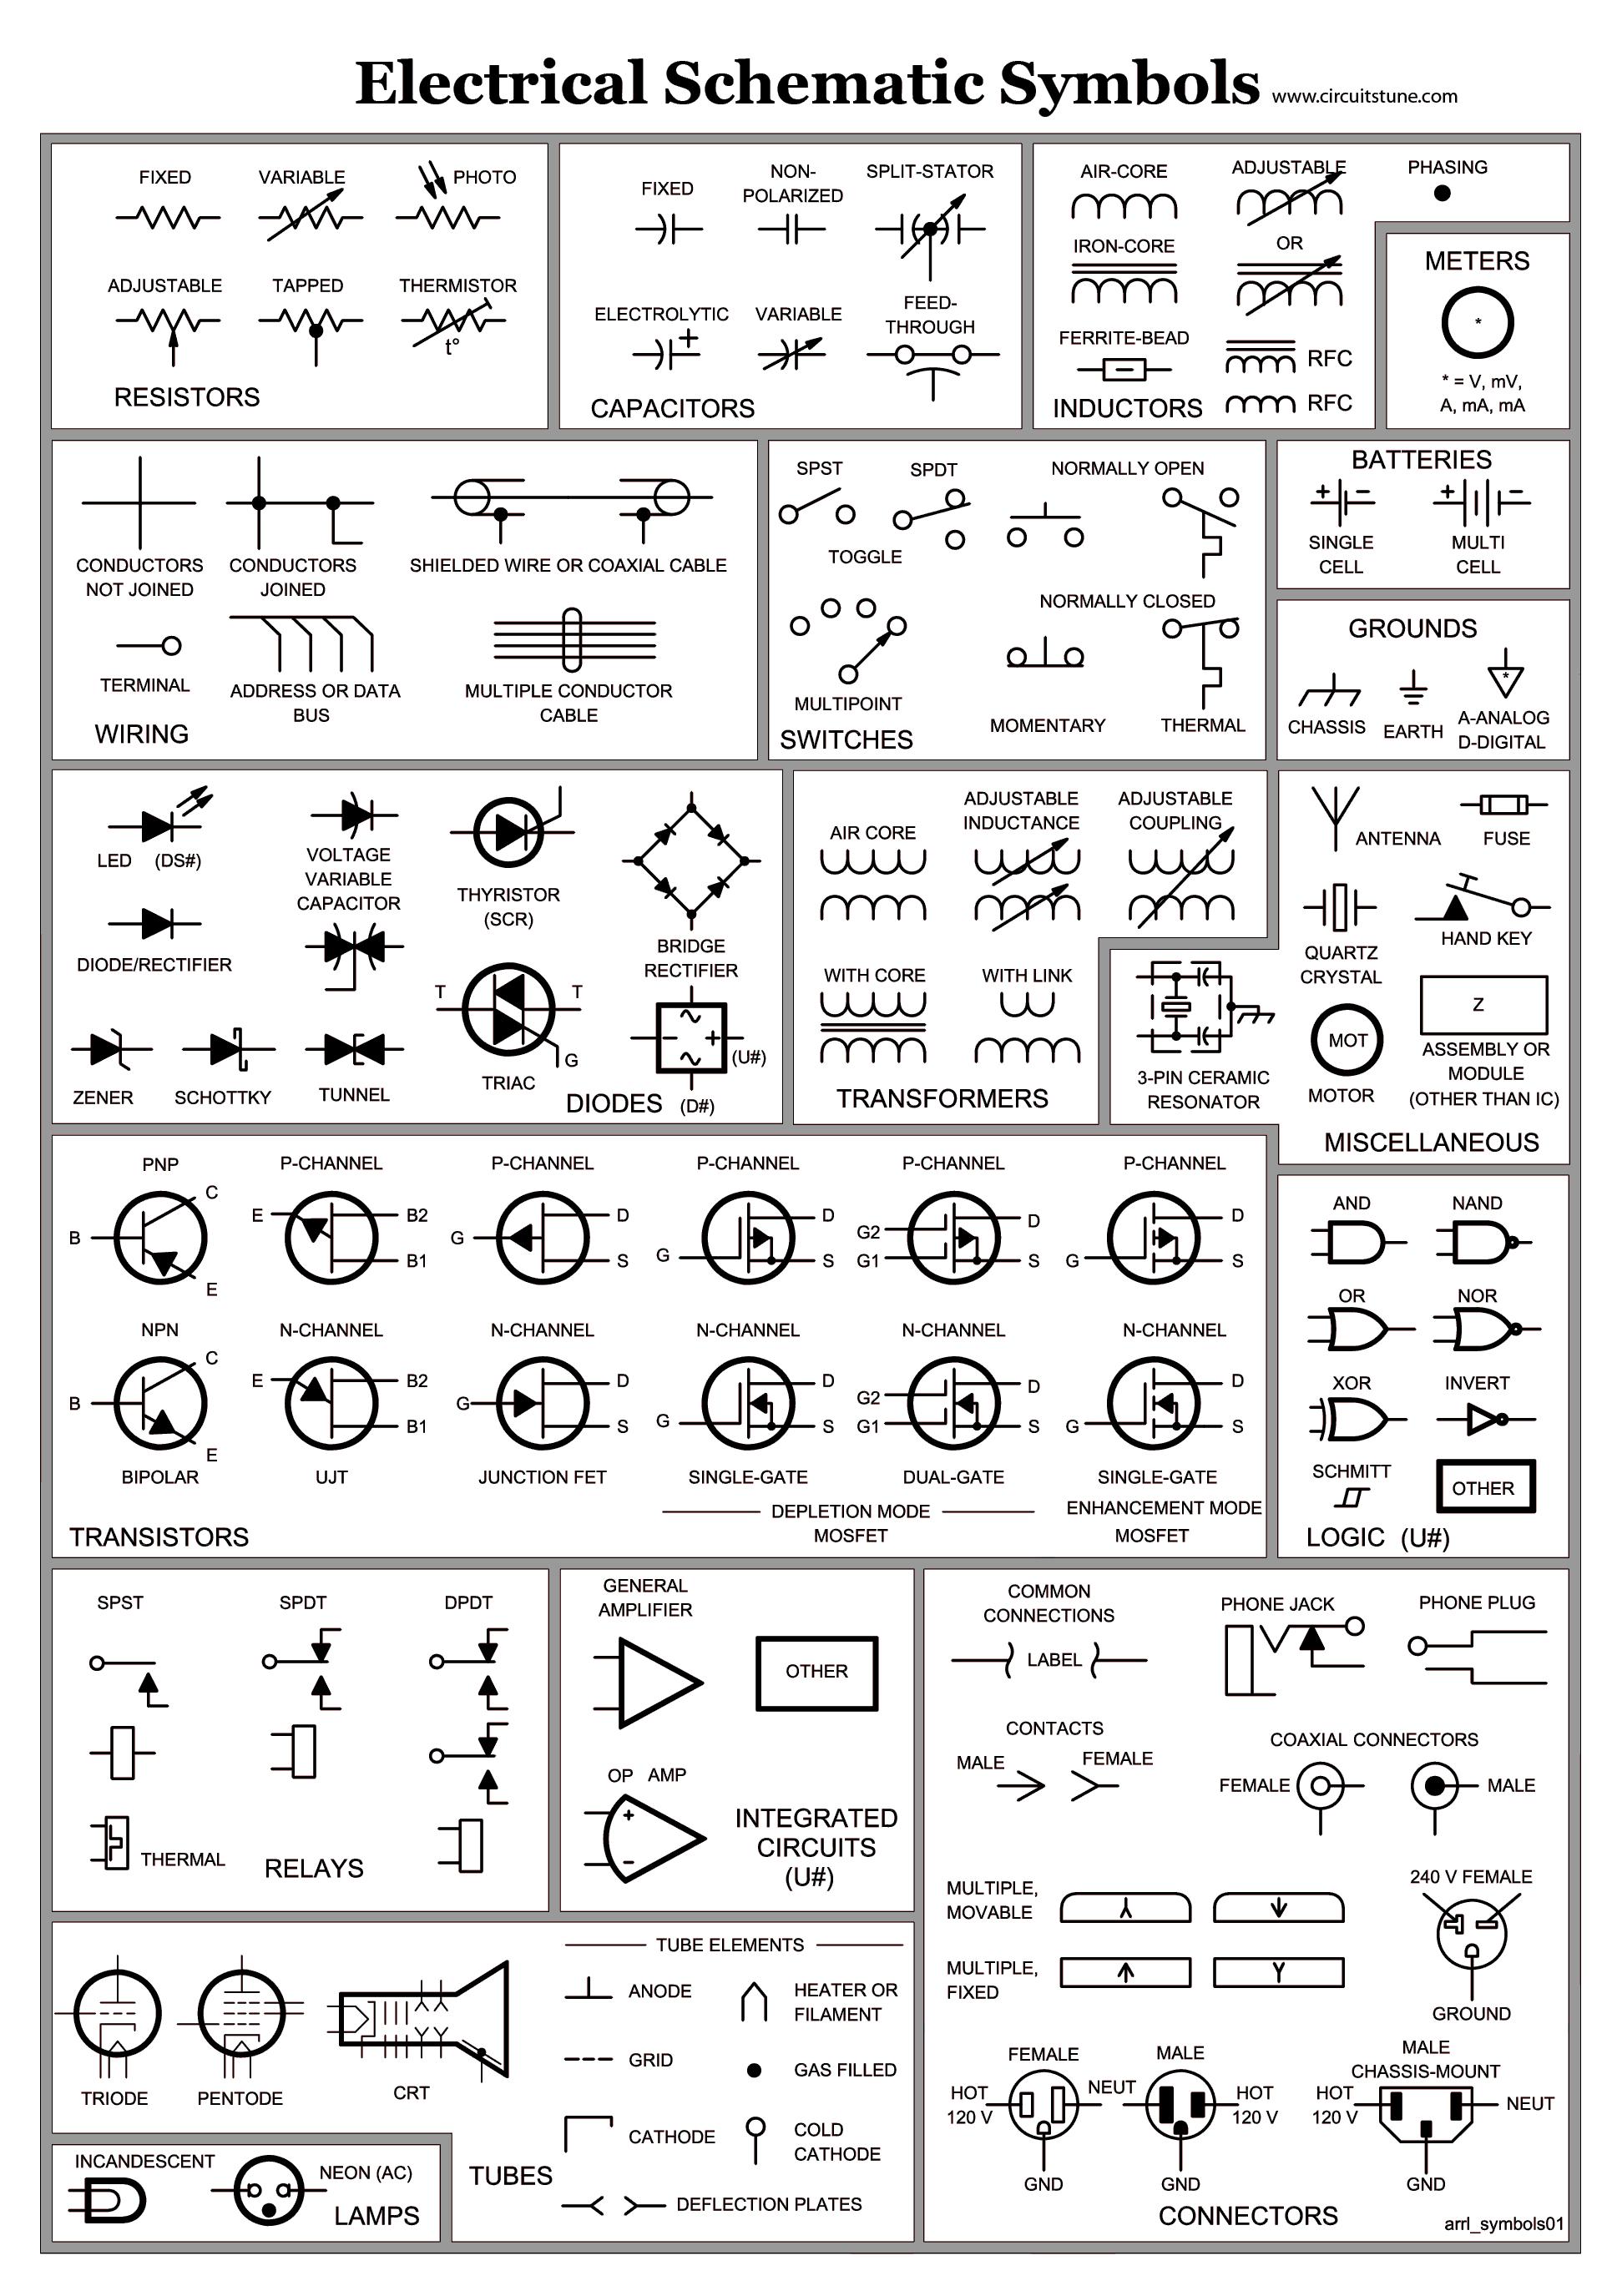 Circuit schematic symbols | BMET Wiki | Fandom | Hvac Wiring Symbols |  | BMET Wiki - Fandom